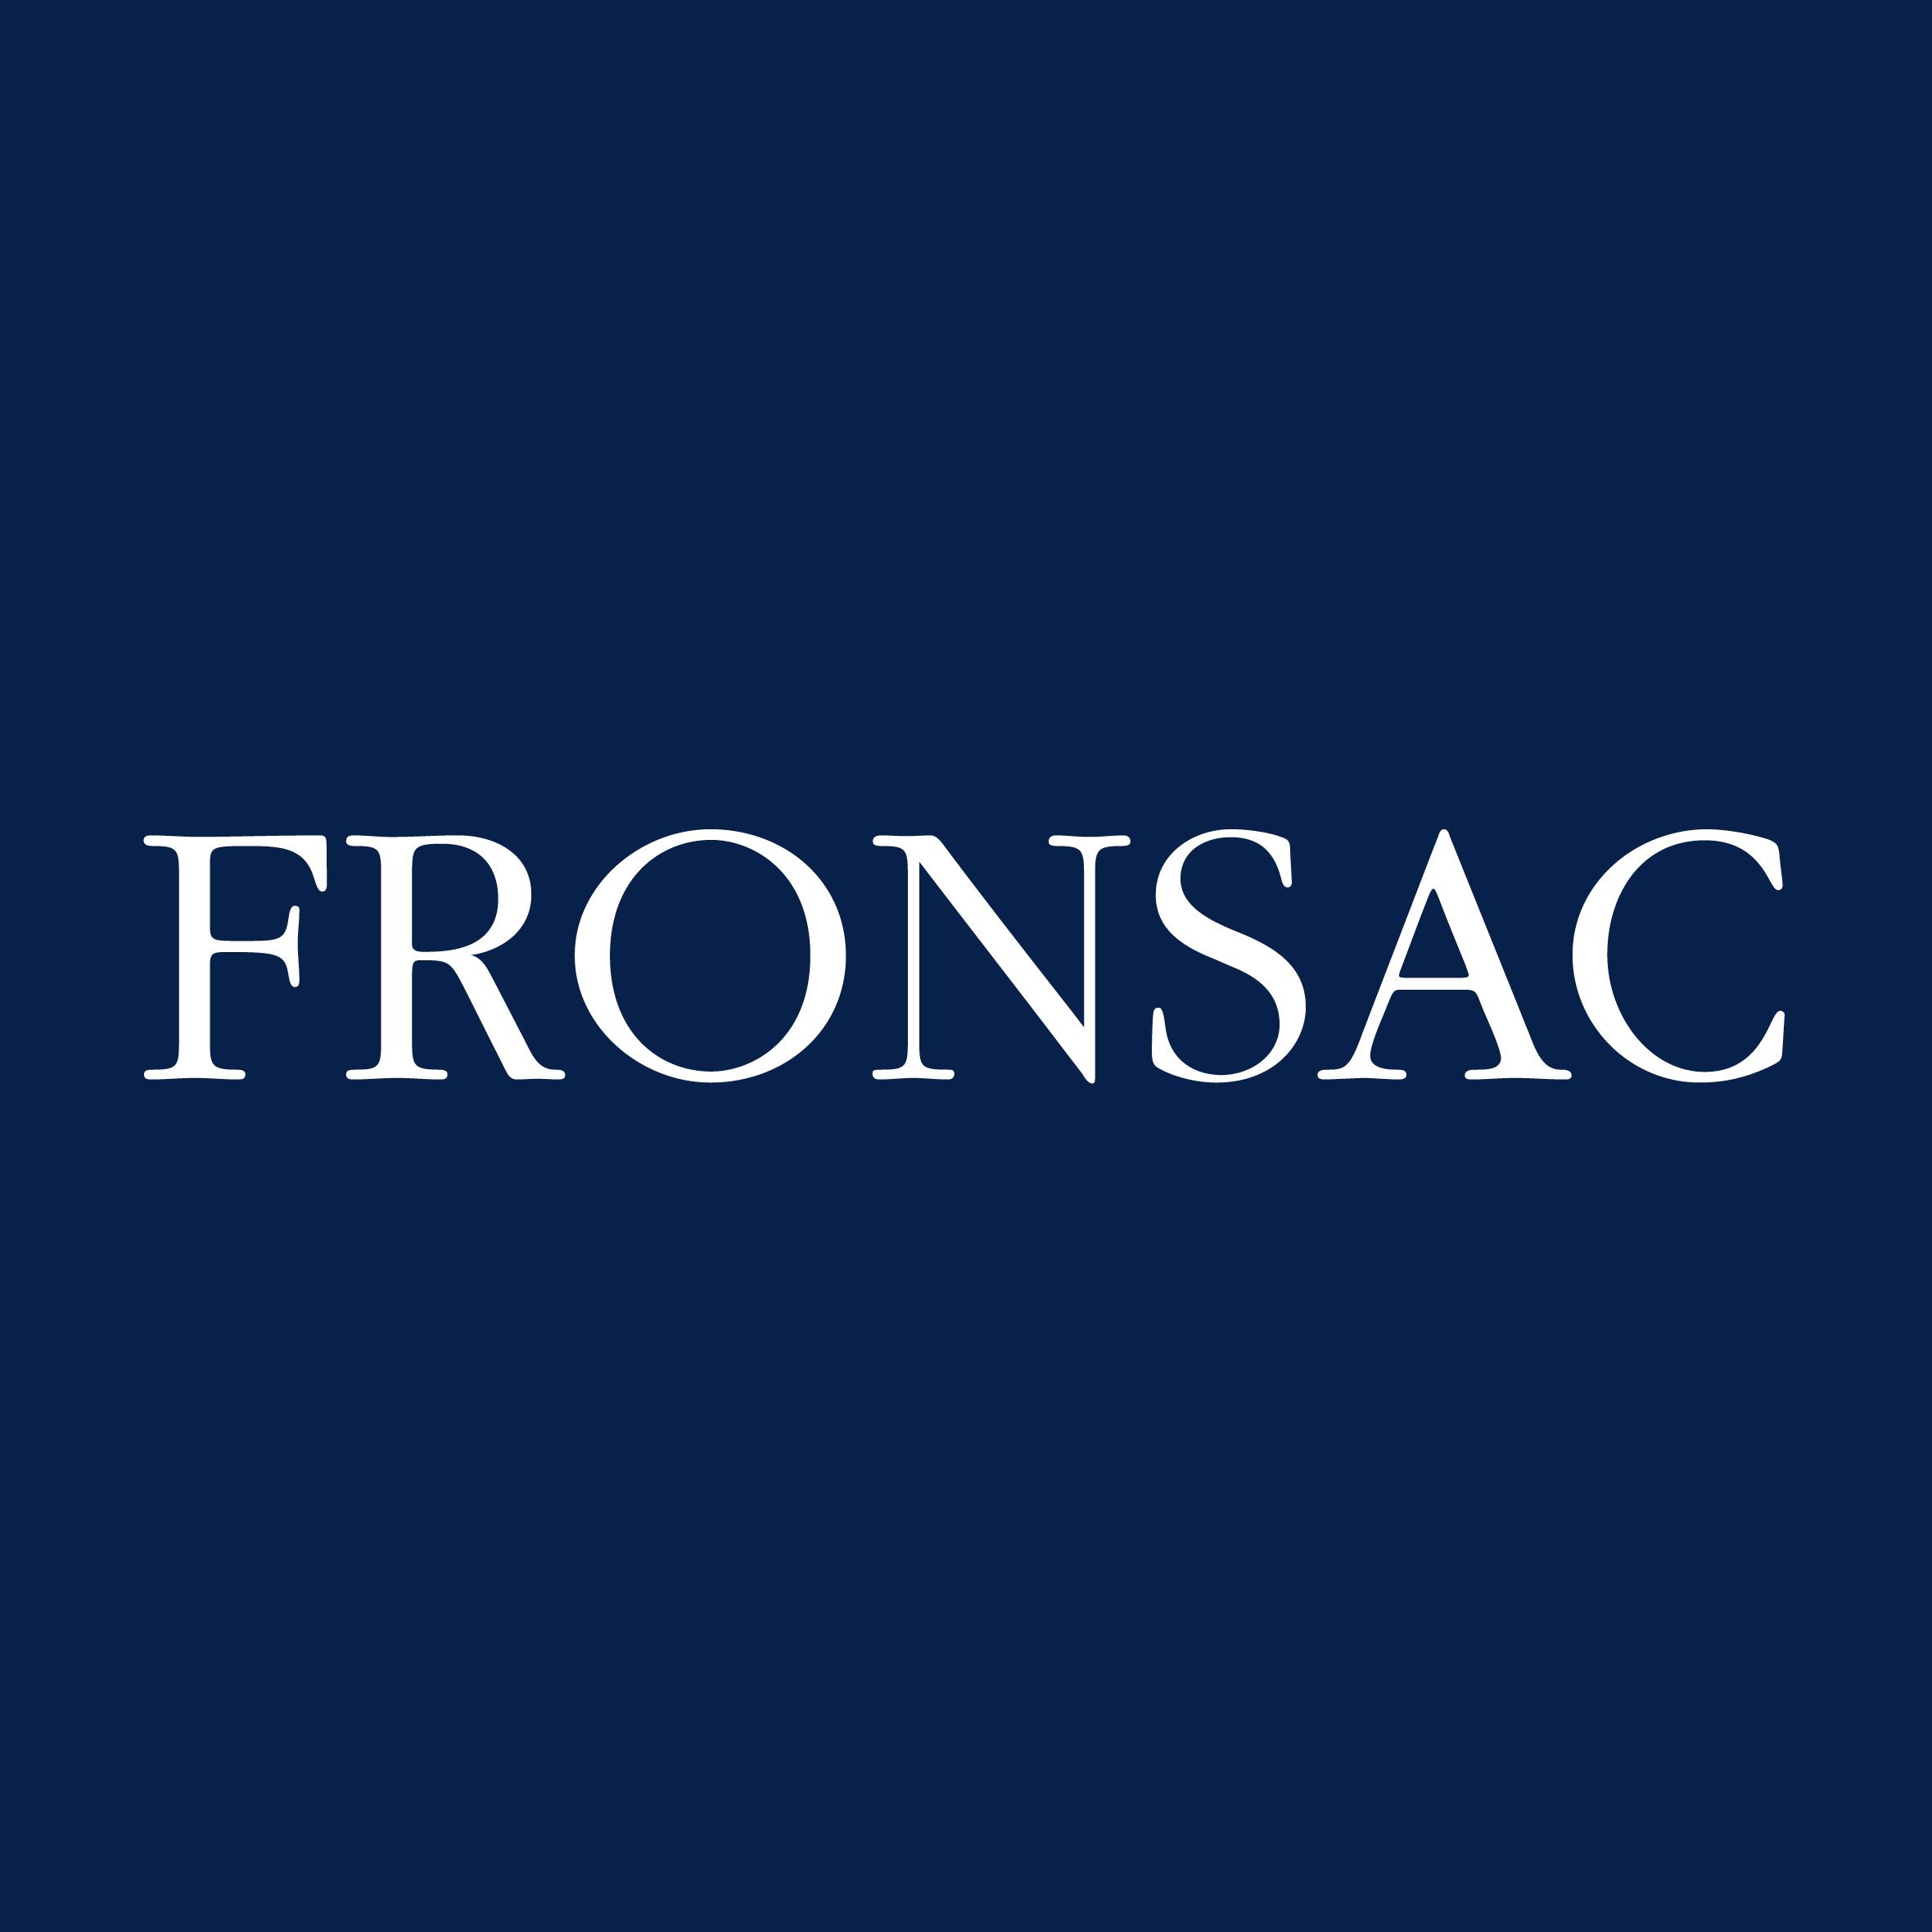 Fronsac Announces Two Joint Venture Acquisitions